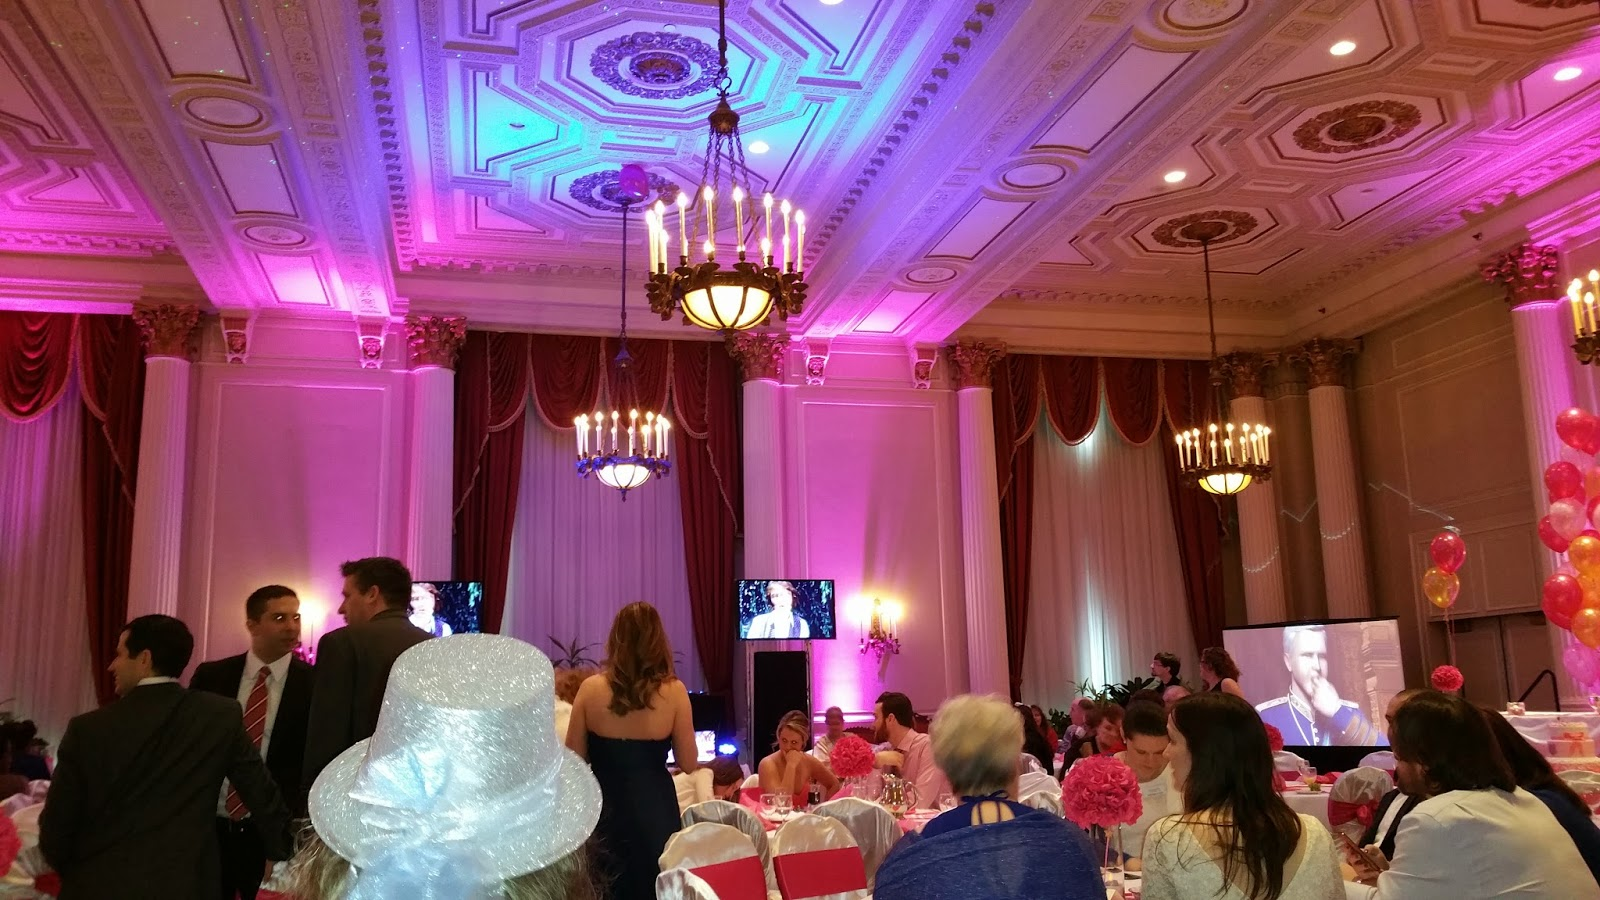 Chateau Laurier Ballroom